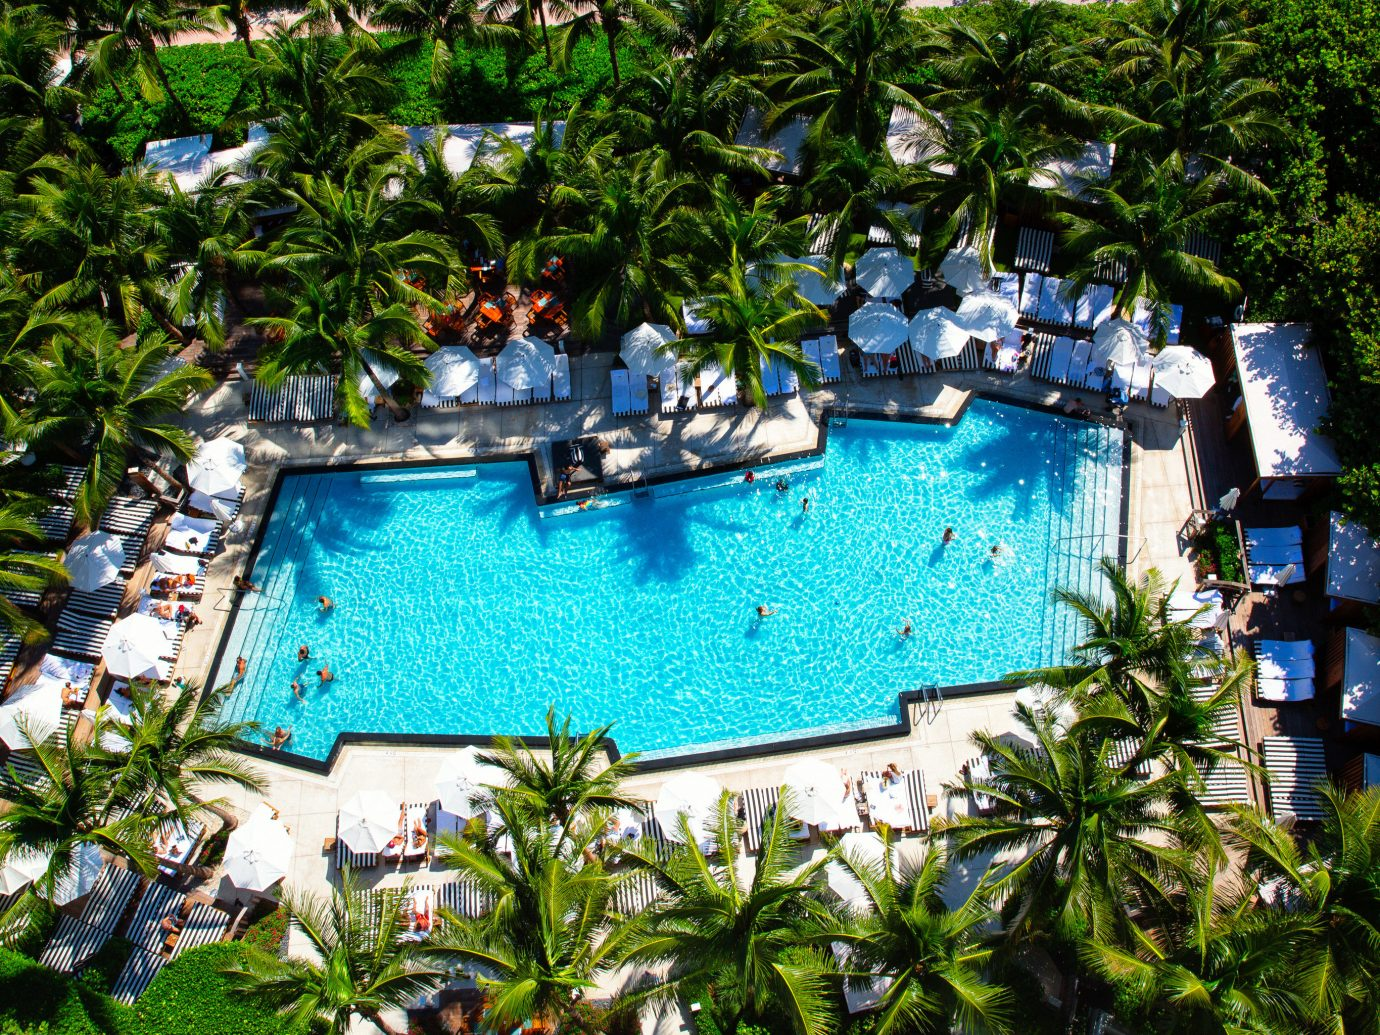 Hotels tree outdoor swimming pool building plant Resort estate backyard Garden pond Jungle flower cottage Villa surrounded several